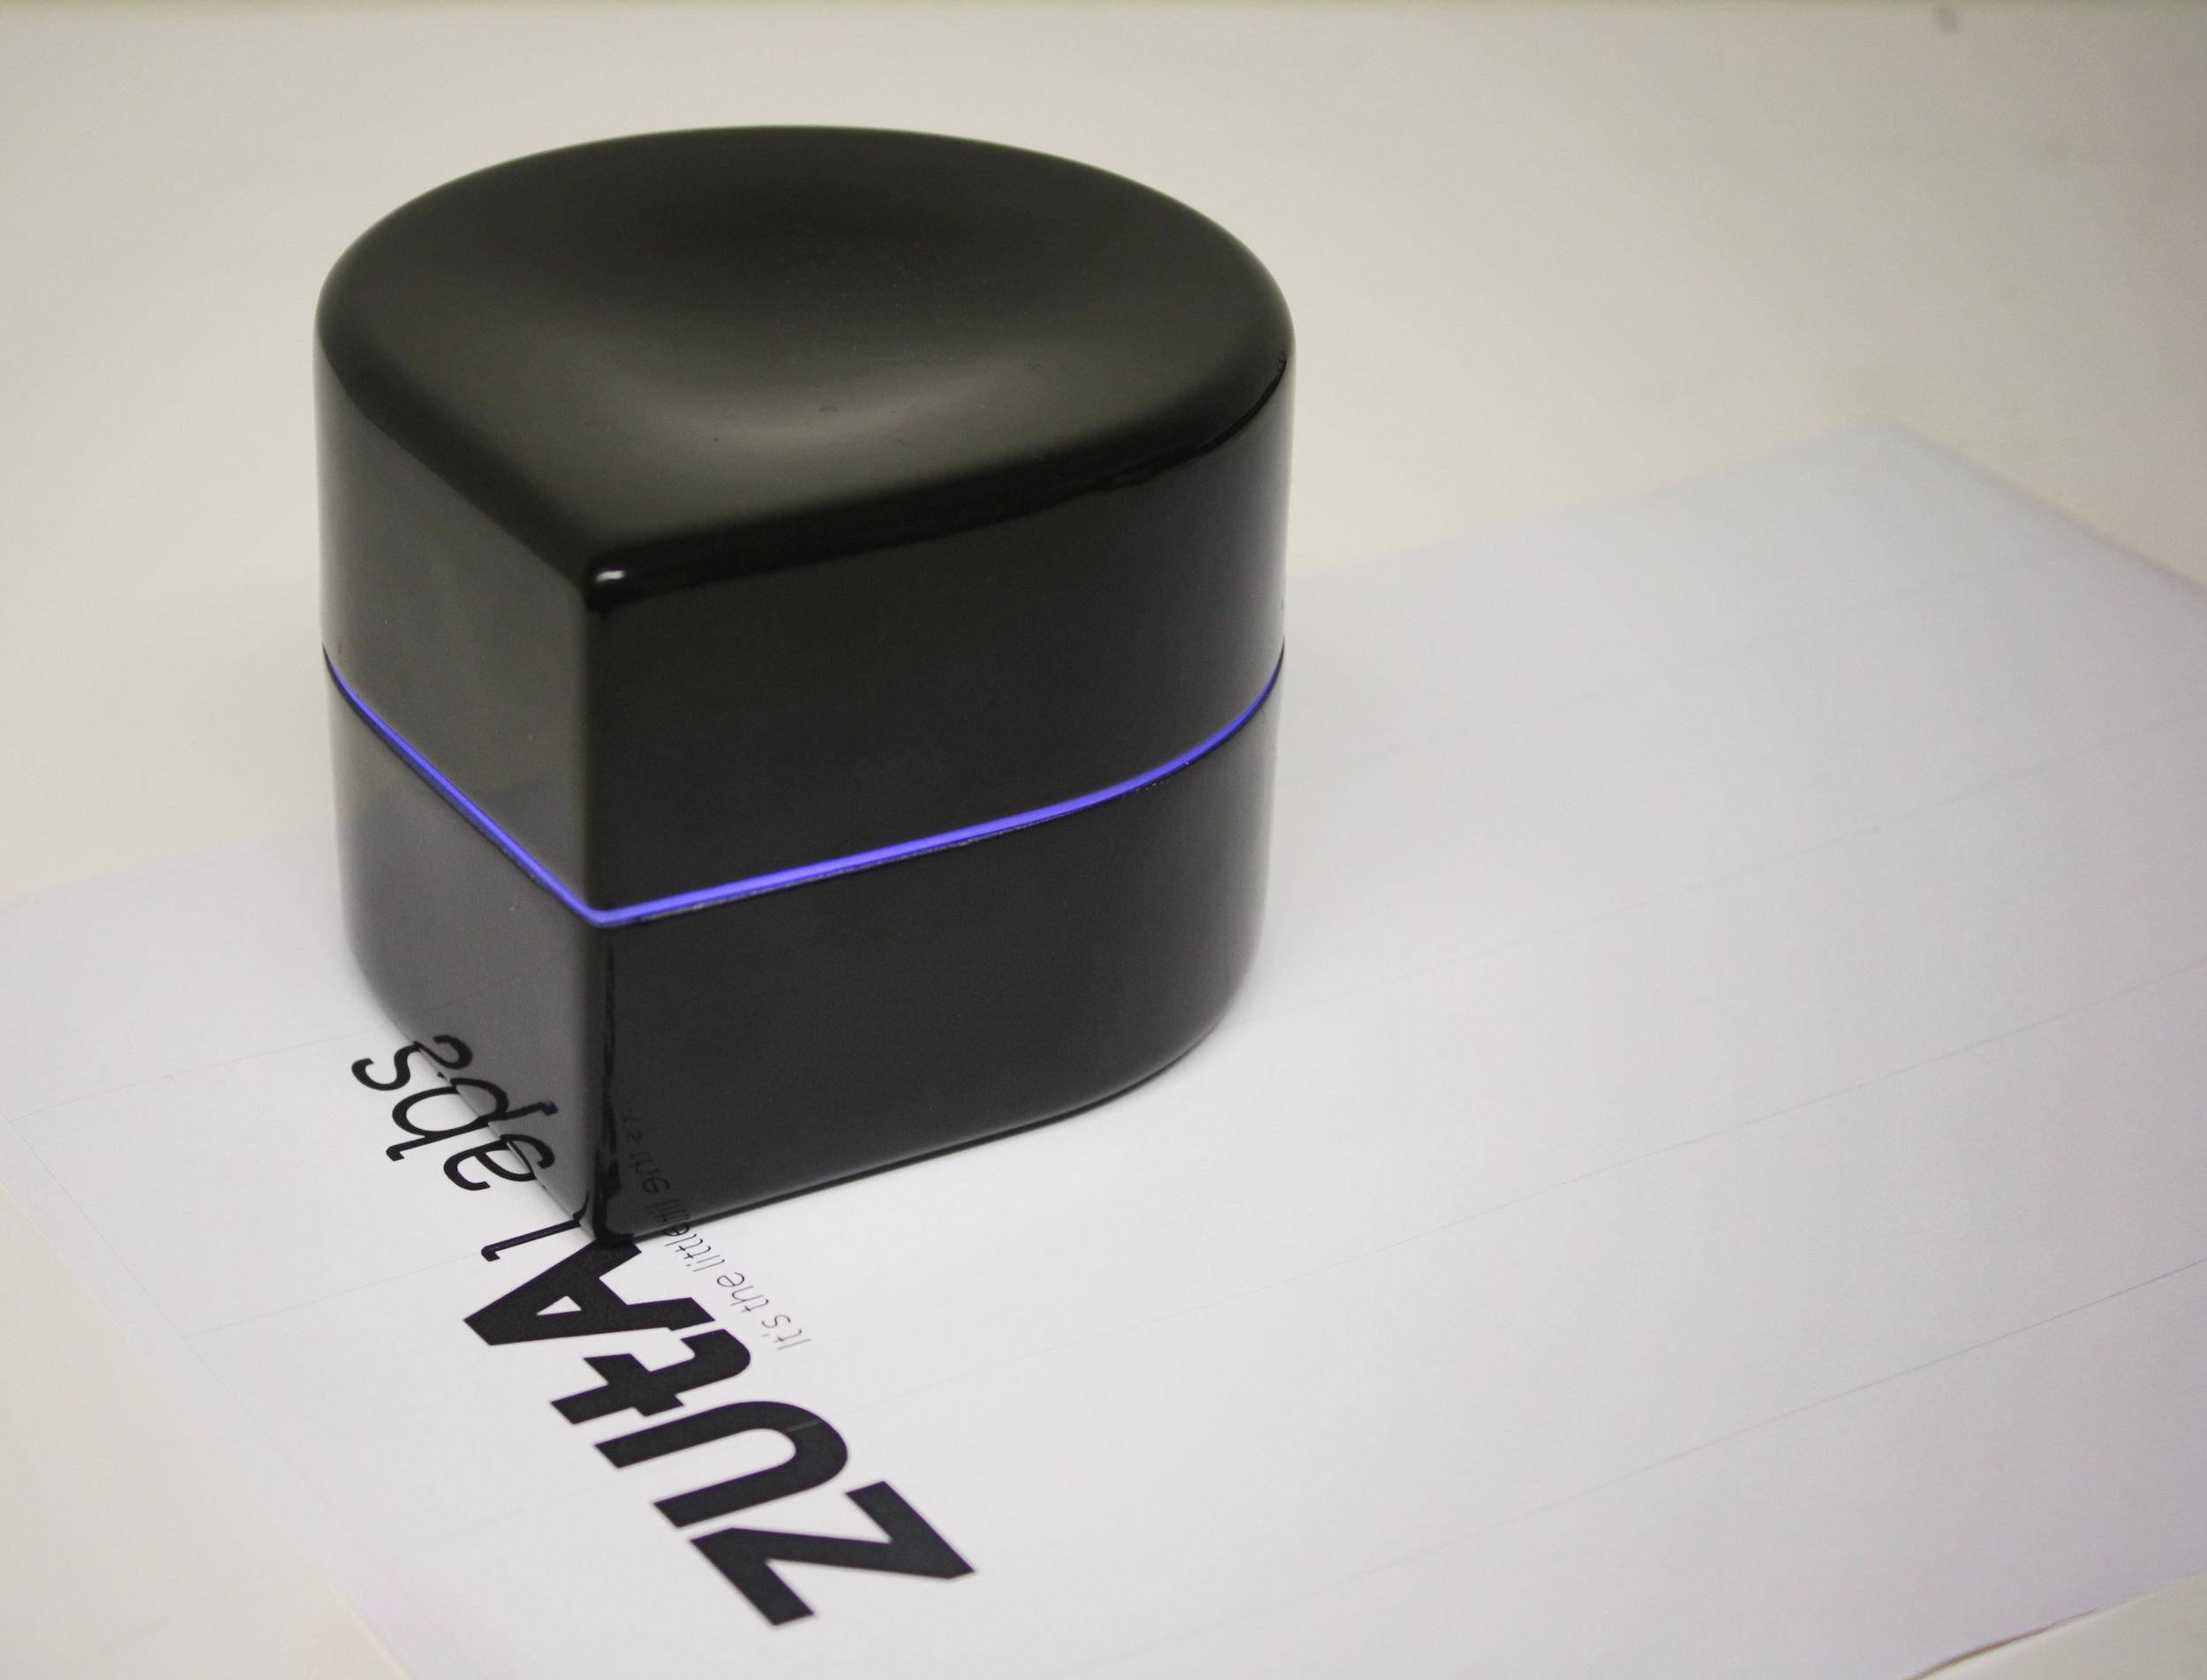 Photo taken from radio zero.com